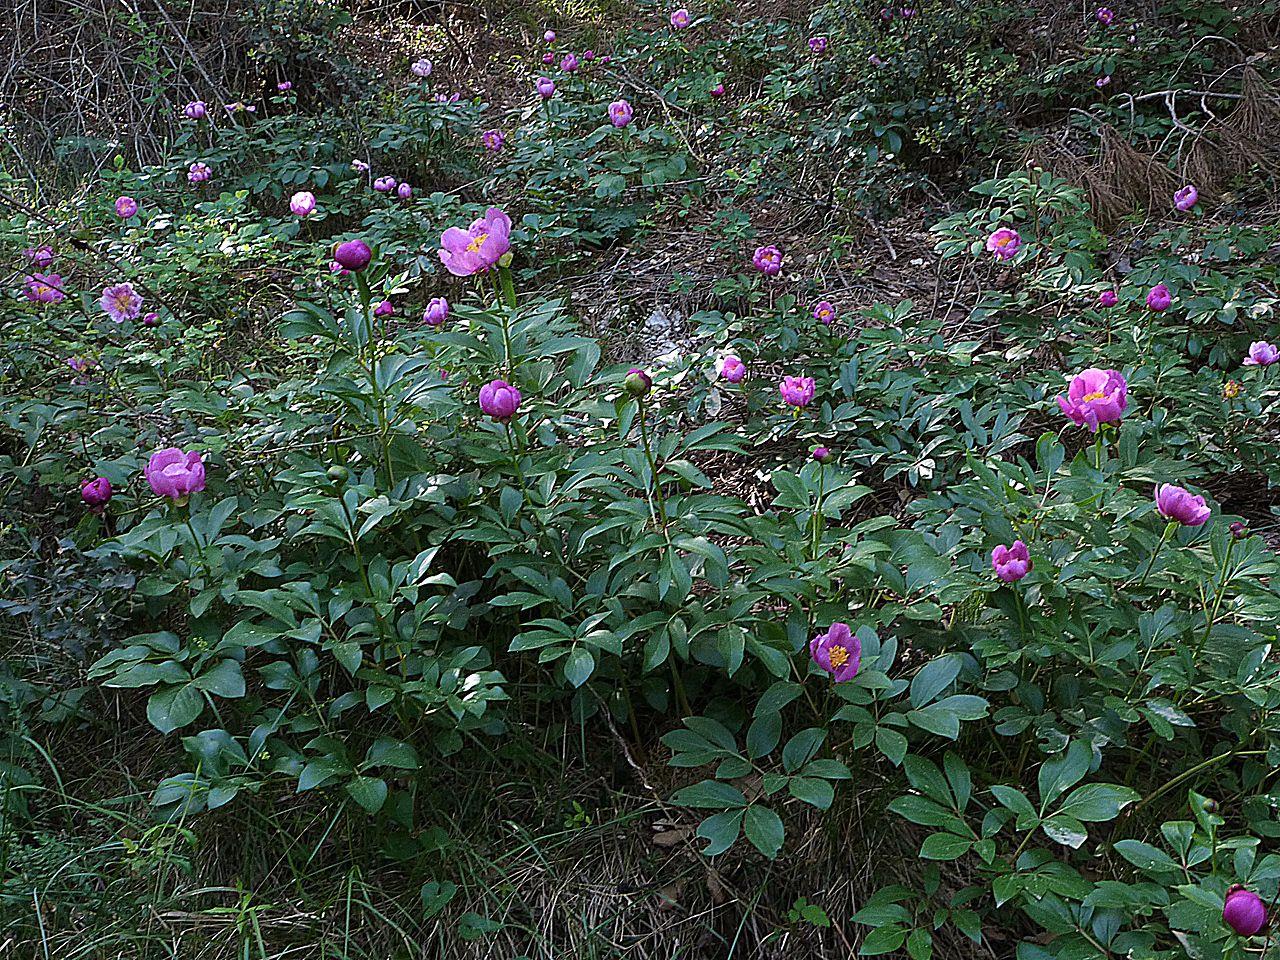 La Paeonia coriacea vive en sombra